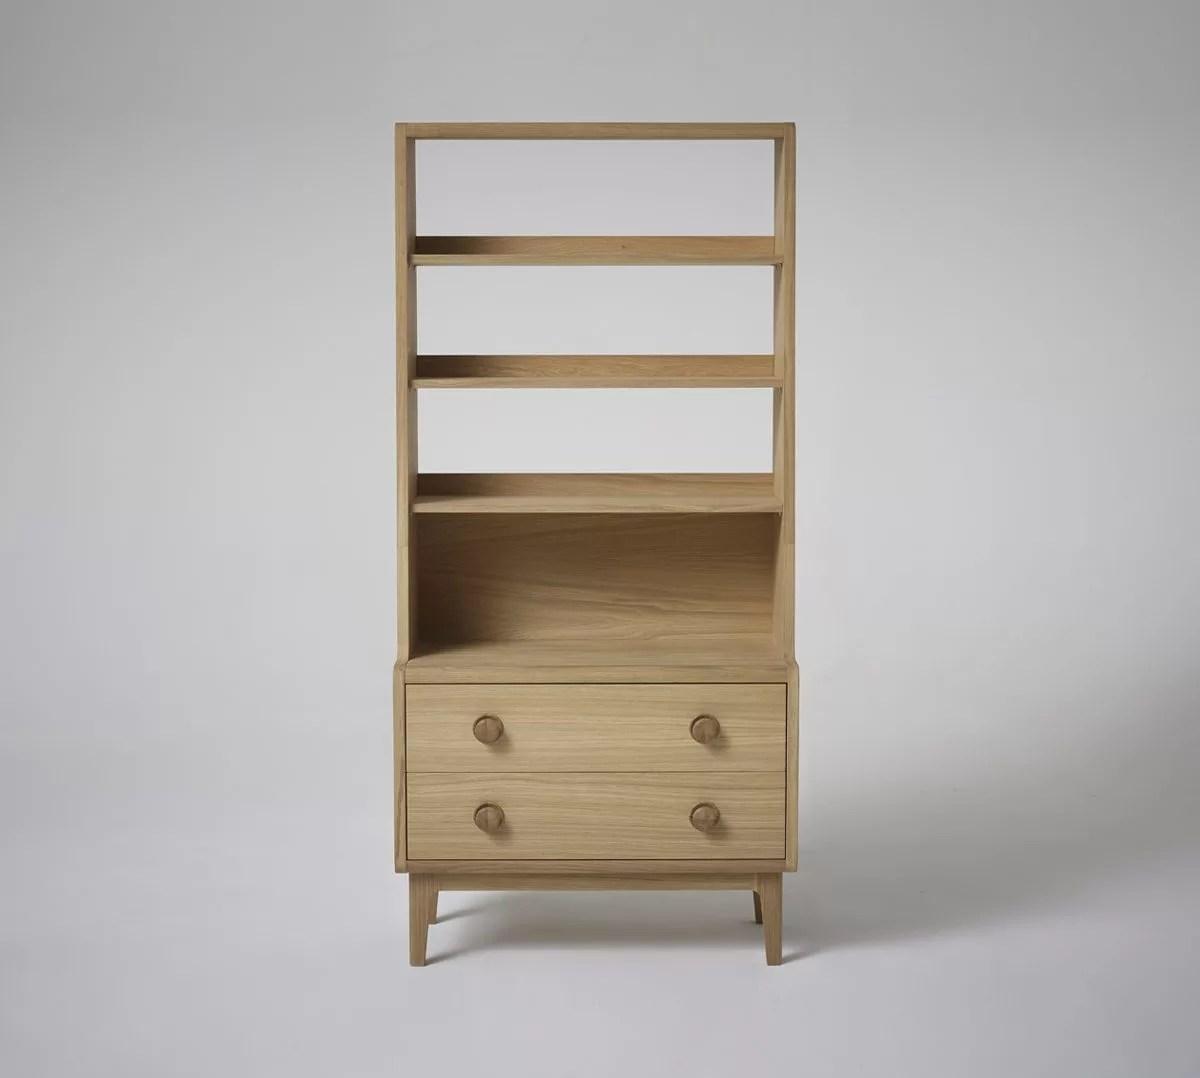 Collection 1 Contemporary Oak Bookcase